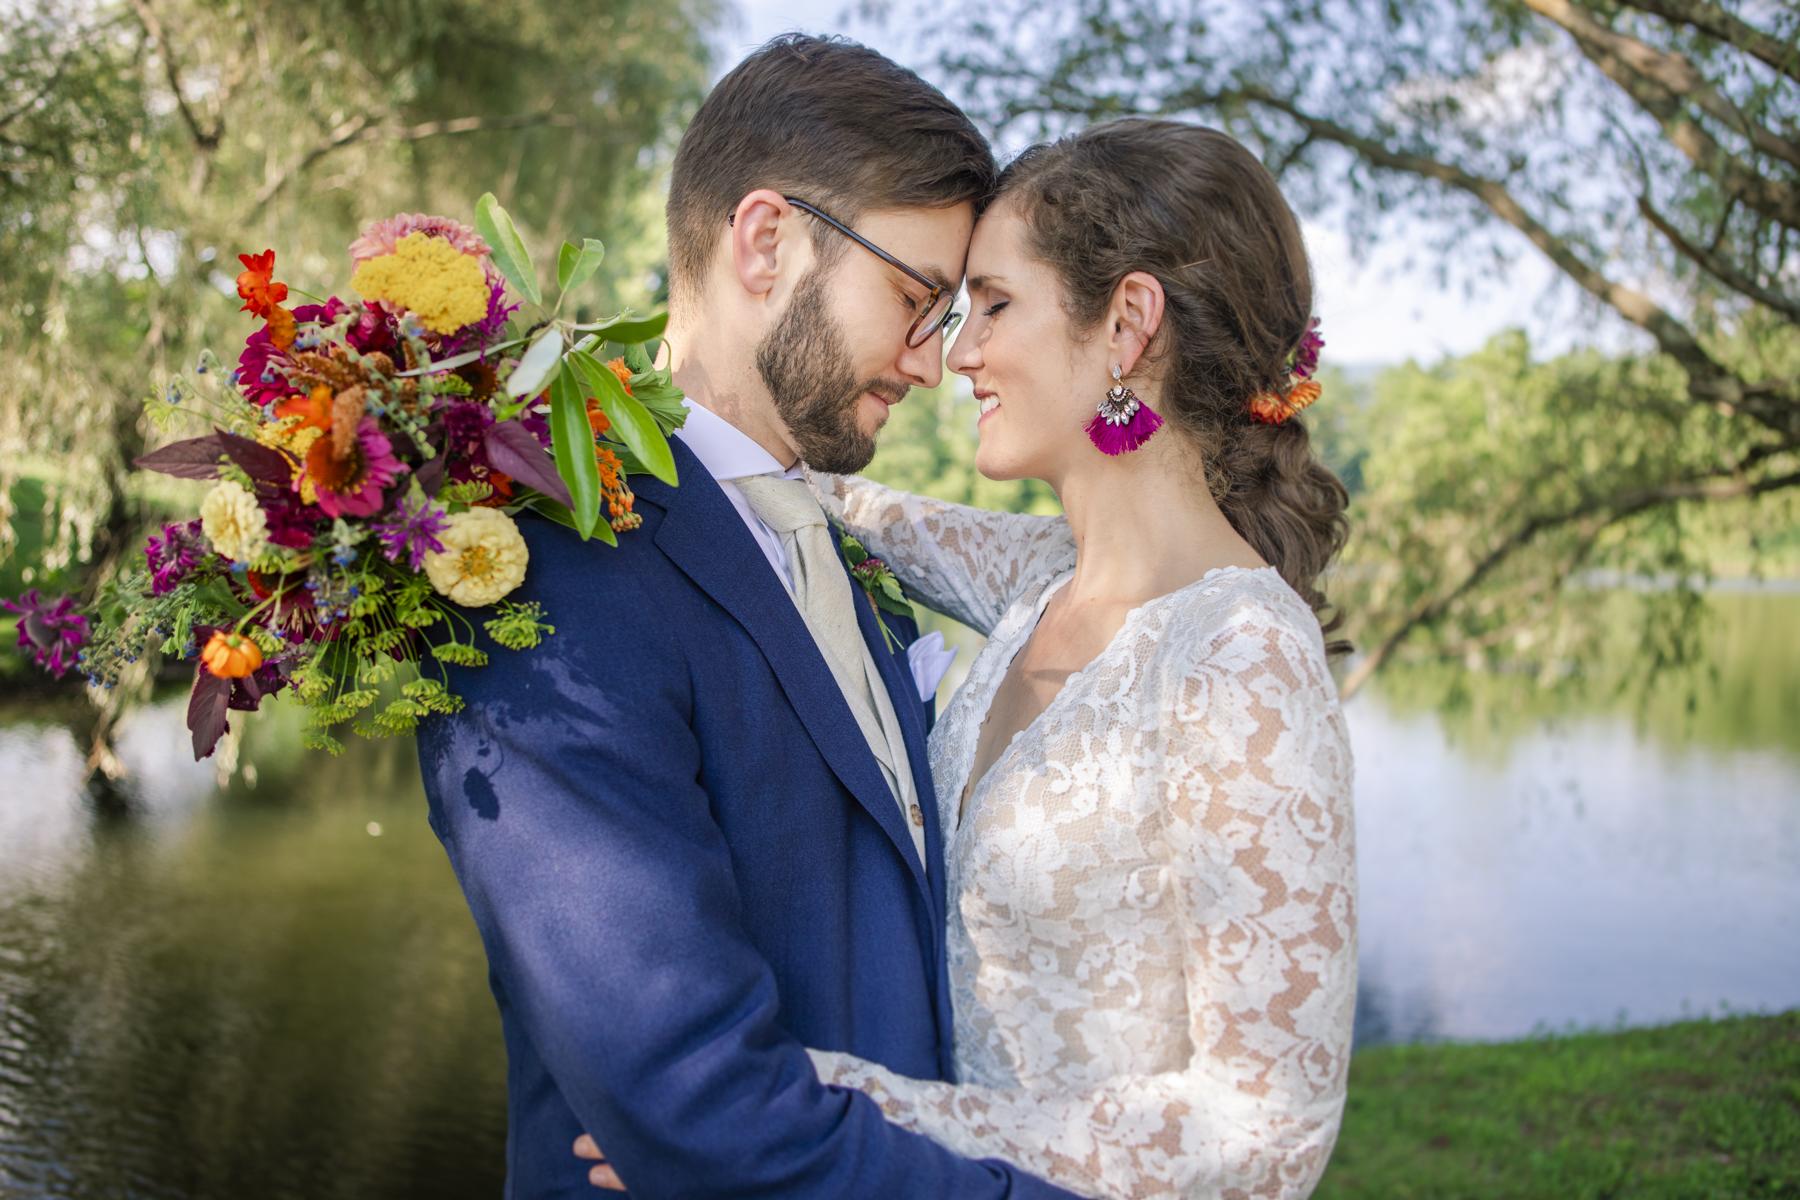 Aimee and Bryan Wedding Anniversary_photos by Studio Misha -2.jpg